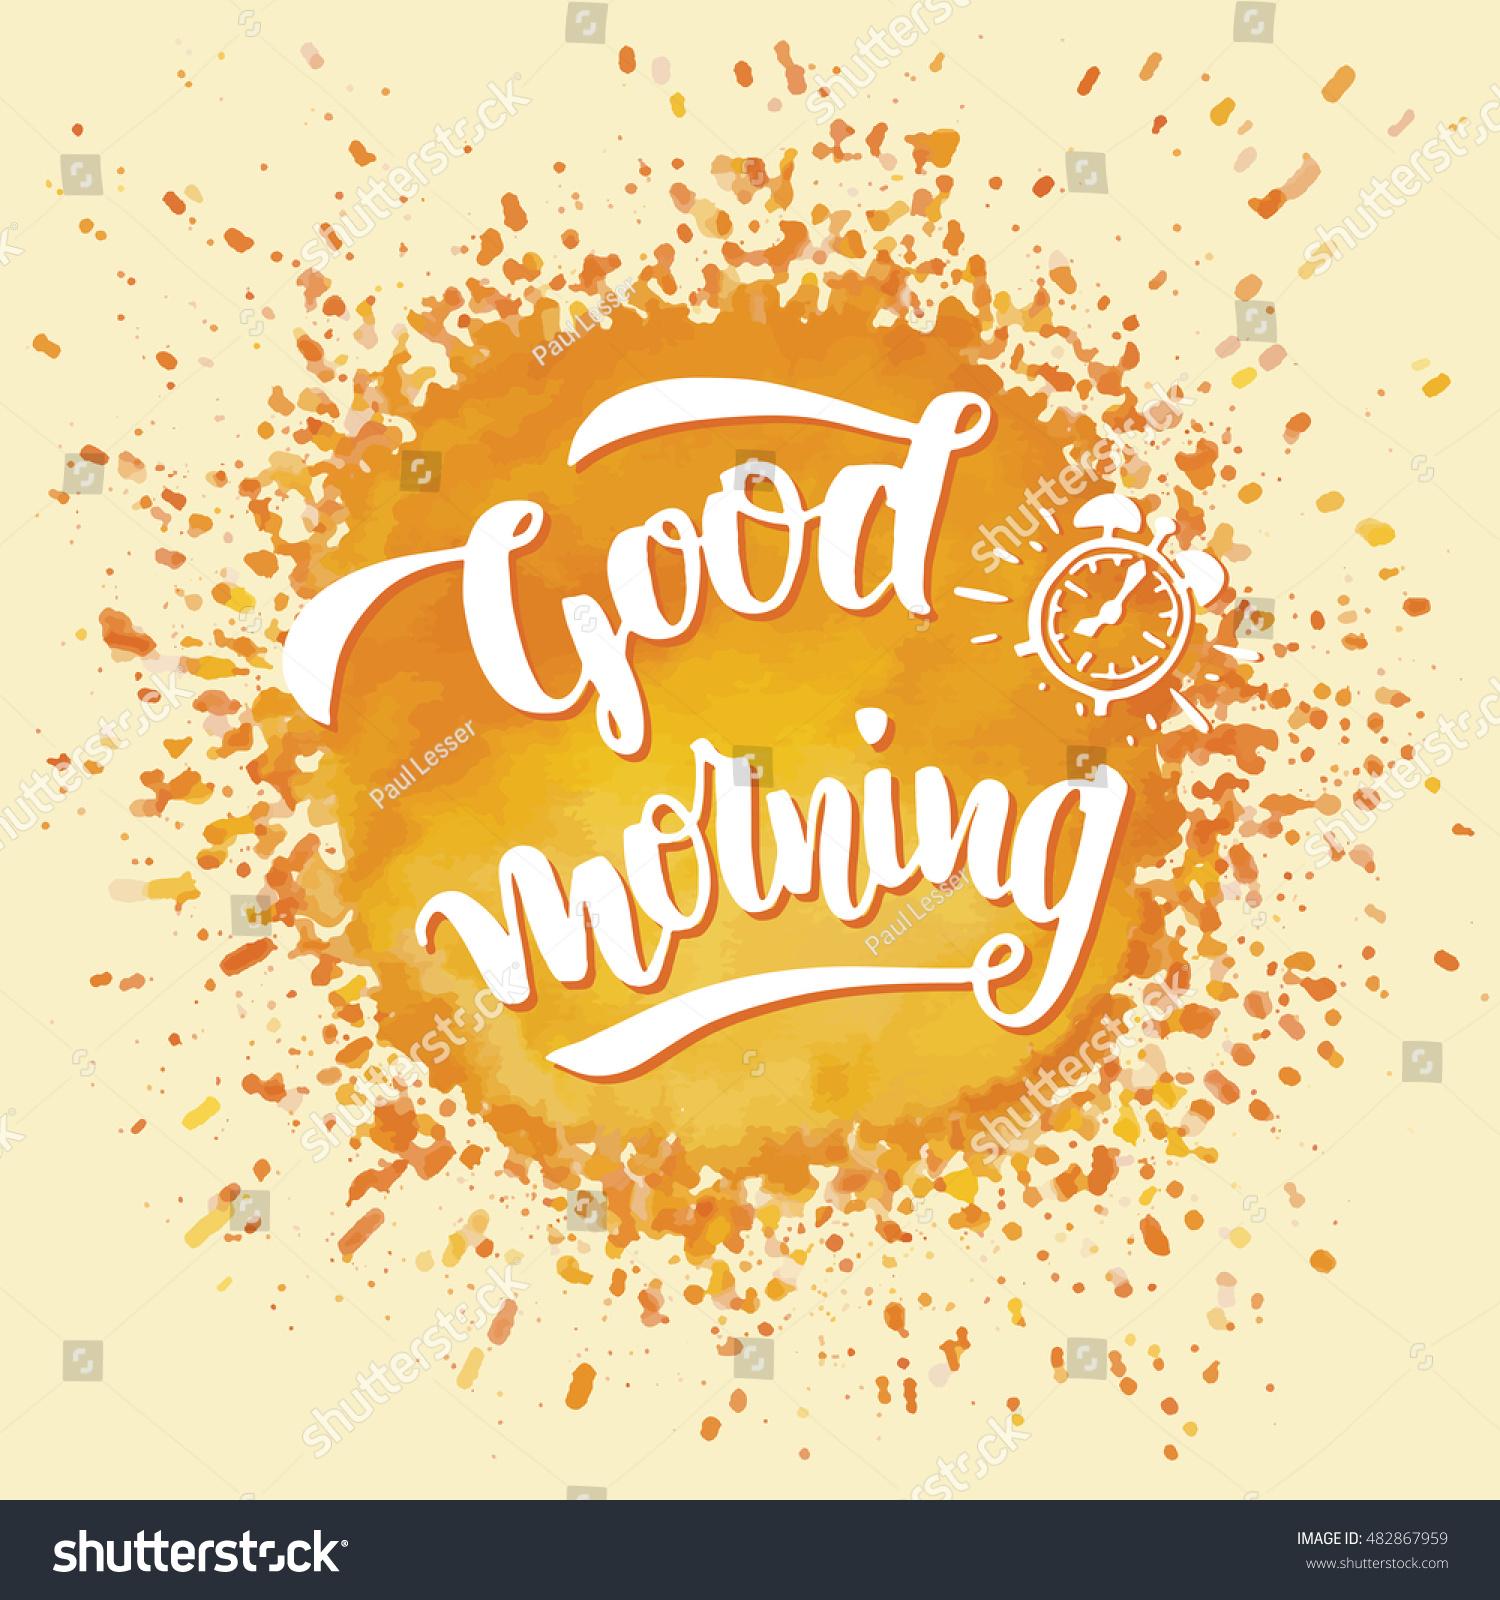 Good morning brush calligraphy on yellow stock vector